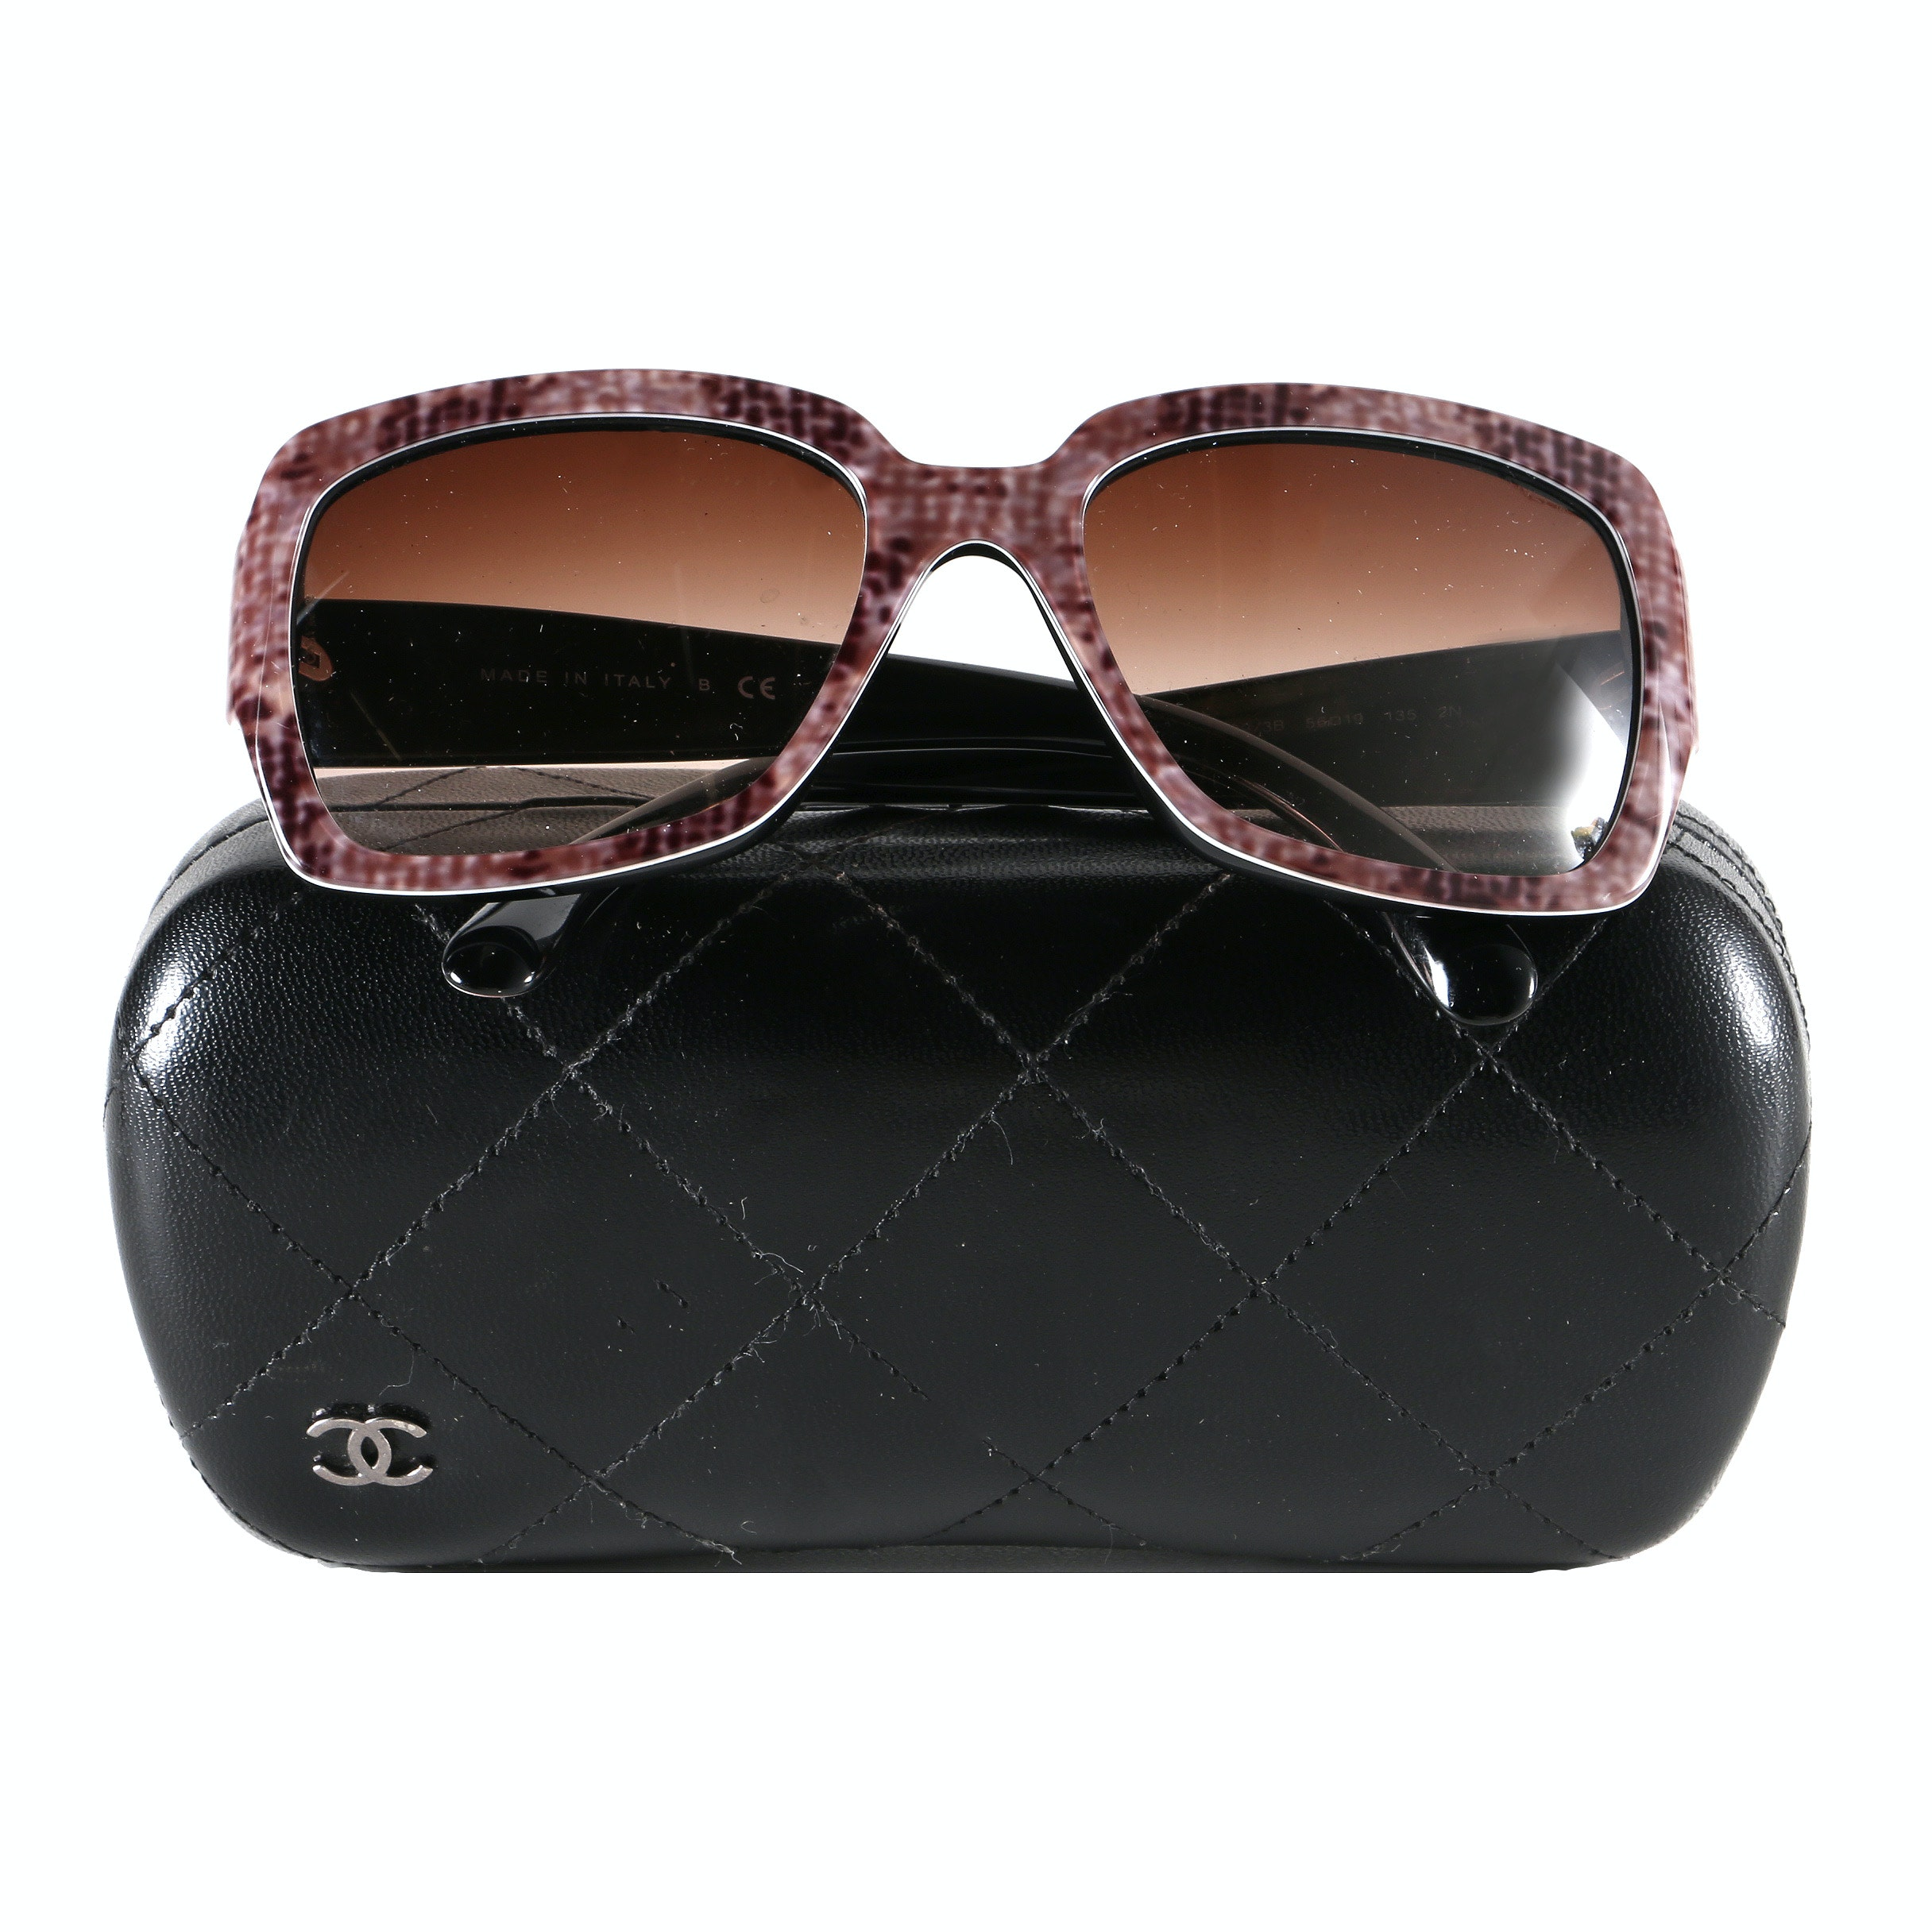 Chanel Tweed Print Sunglasses